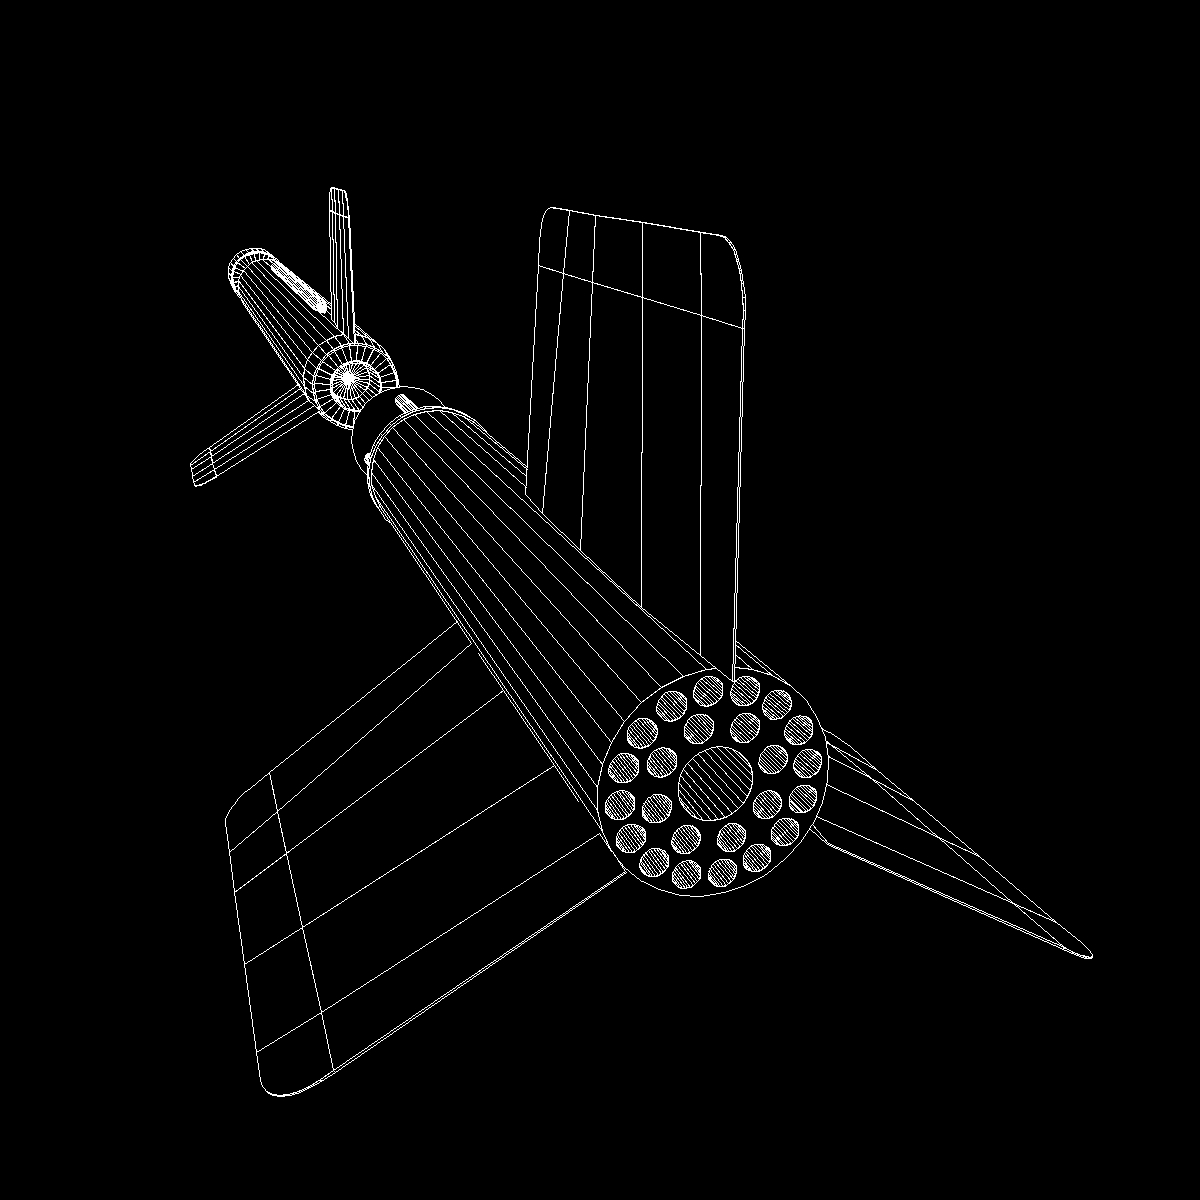 us wac corporal rocket 3d model 3ds dxf x cod scn obj 149628